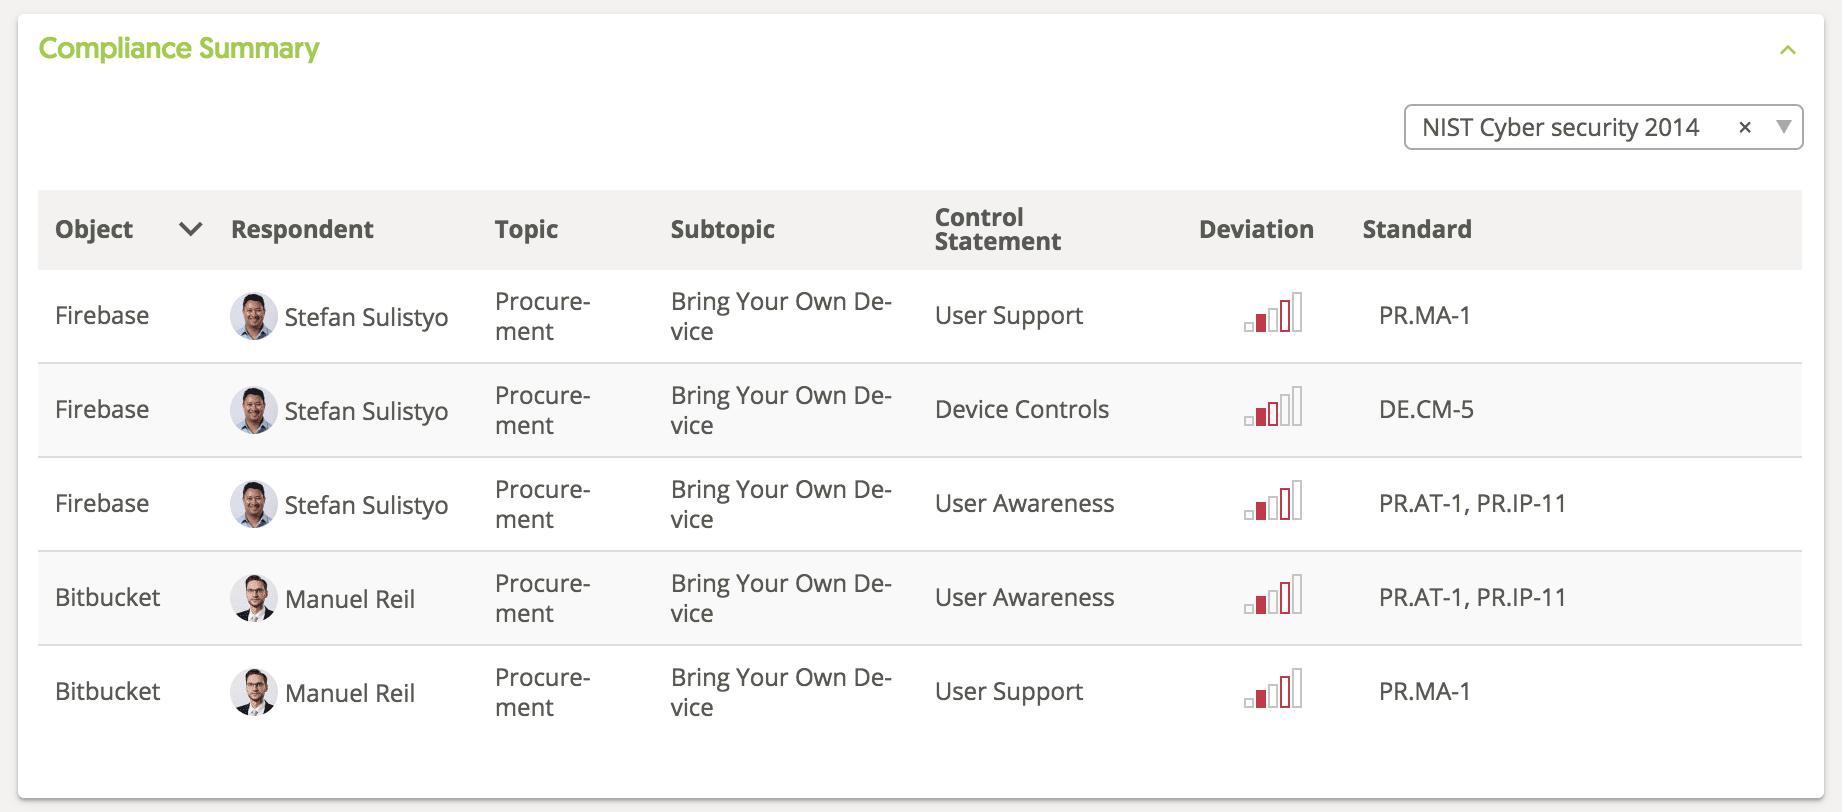 Report Compliance Summary